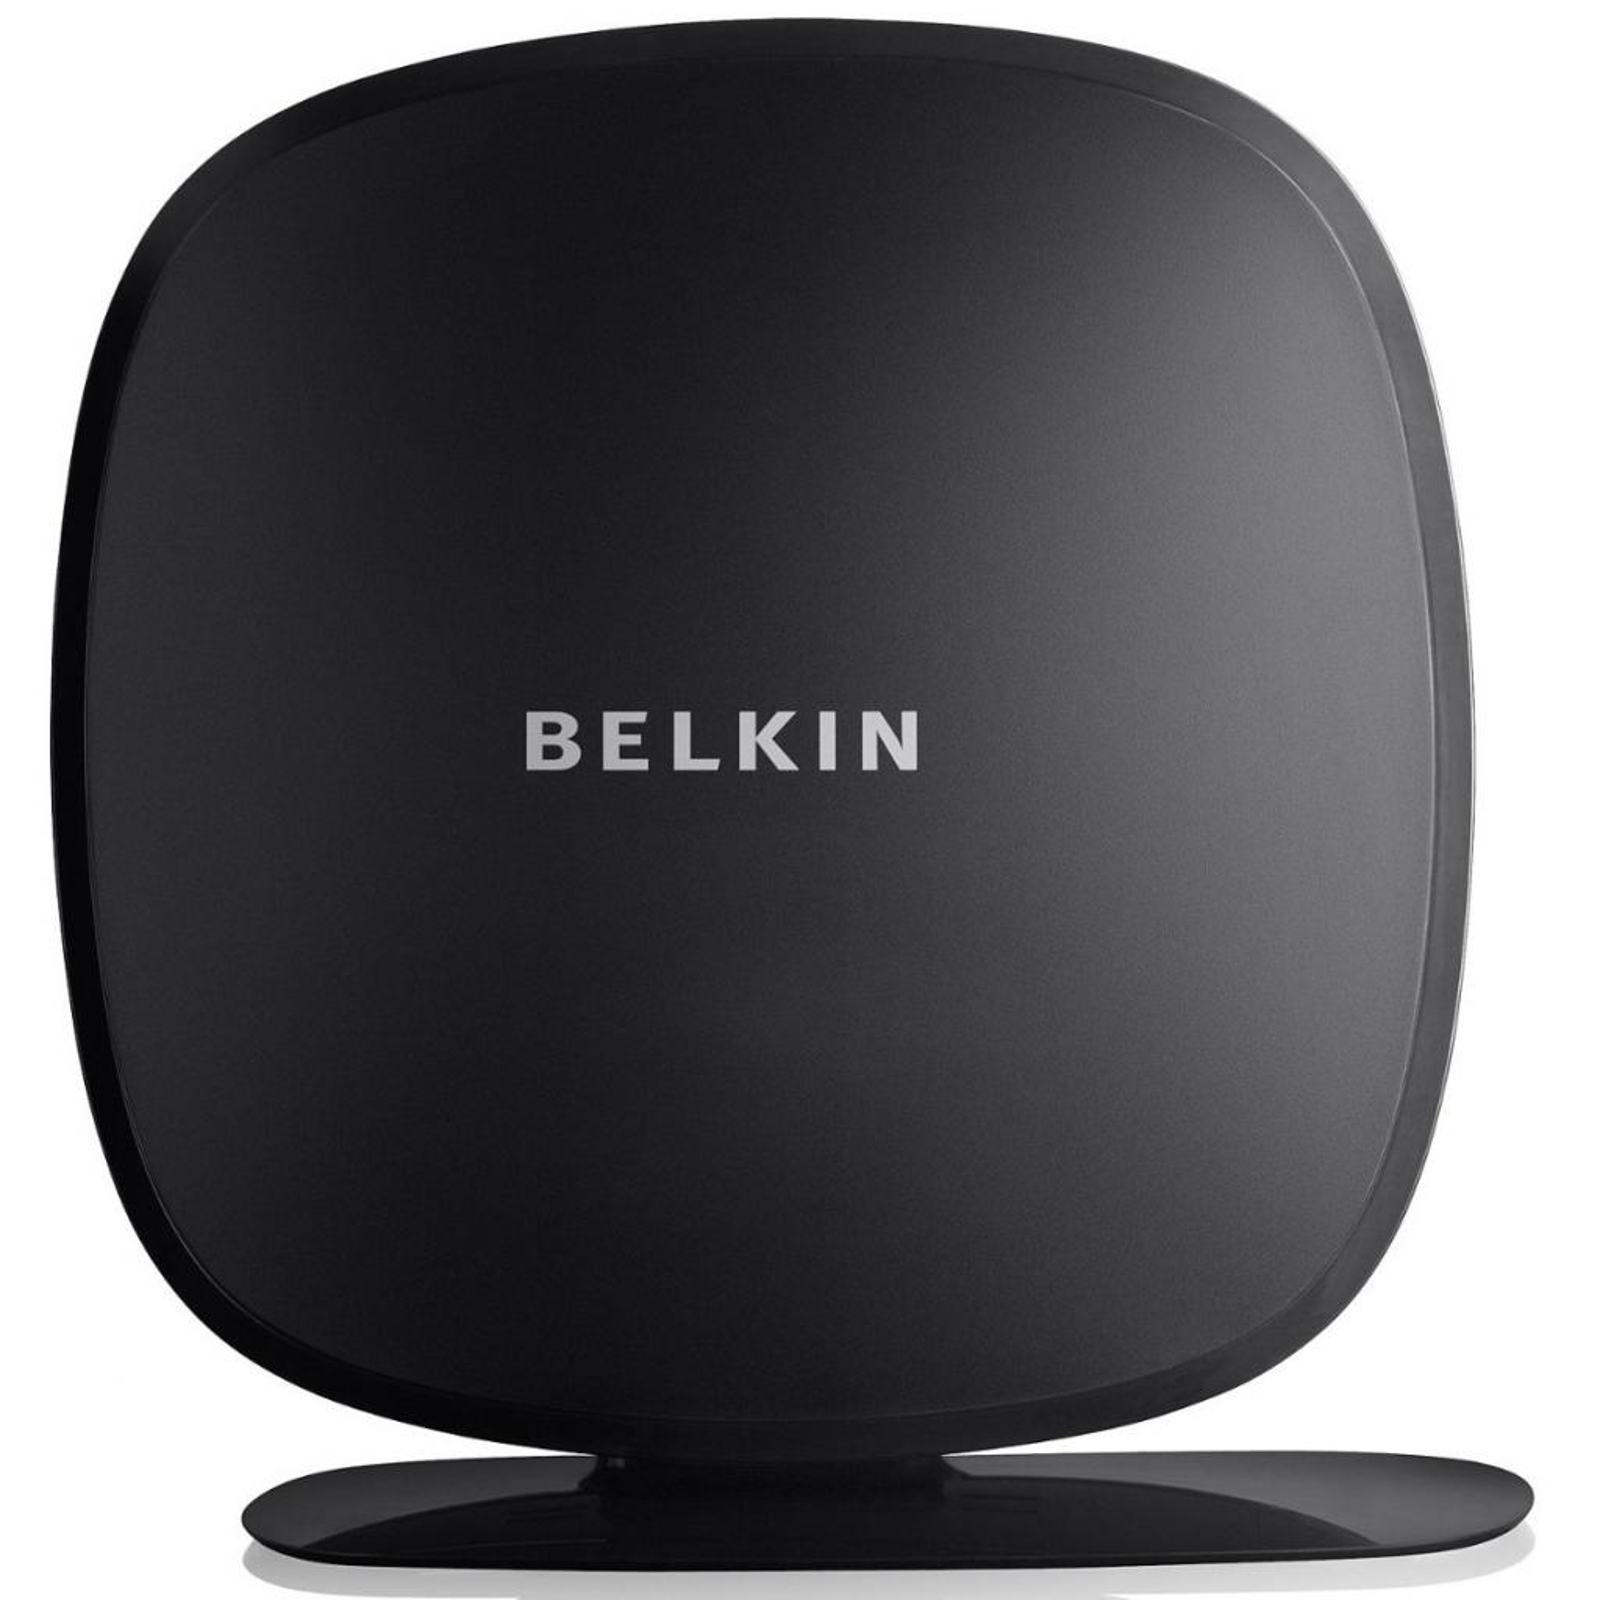 Маршрутизатор Belkin F9K1105ru изображение 2